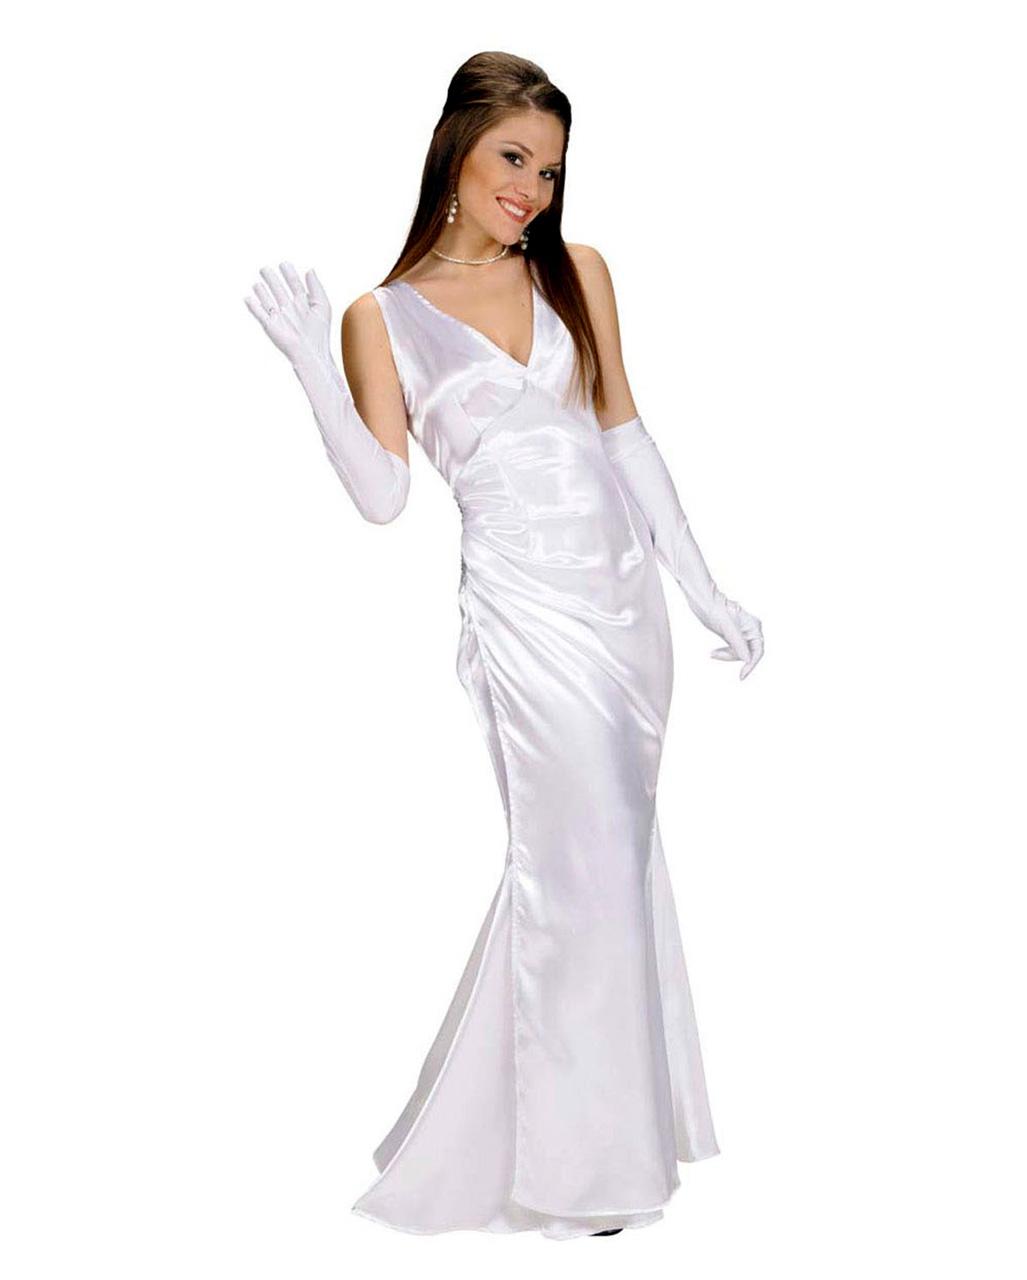 Abendkleid Weiss Gr S Als Prom Queen Kostum Horror Shop Com